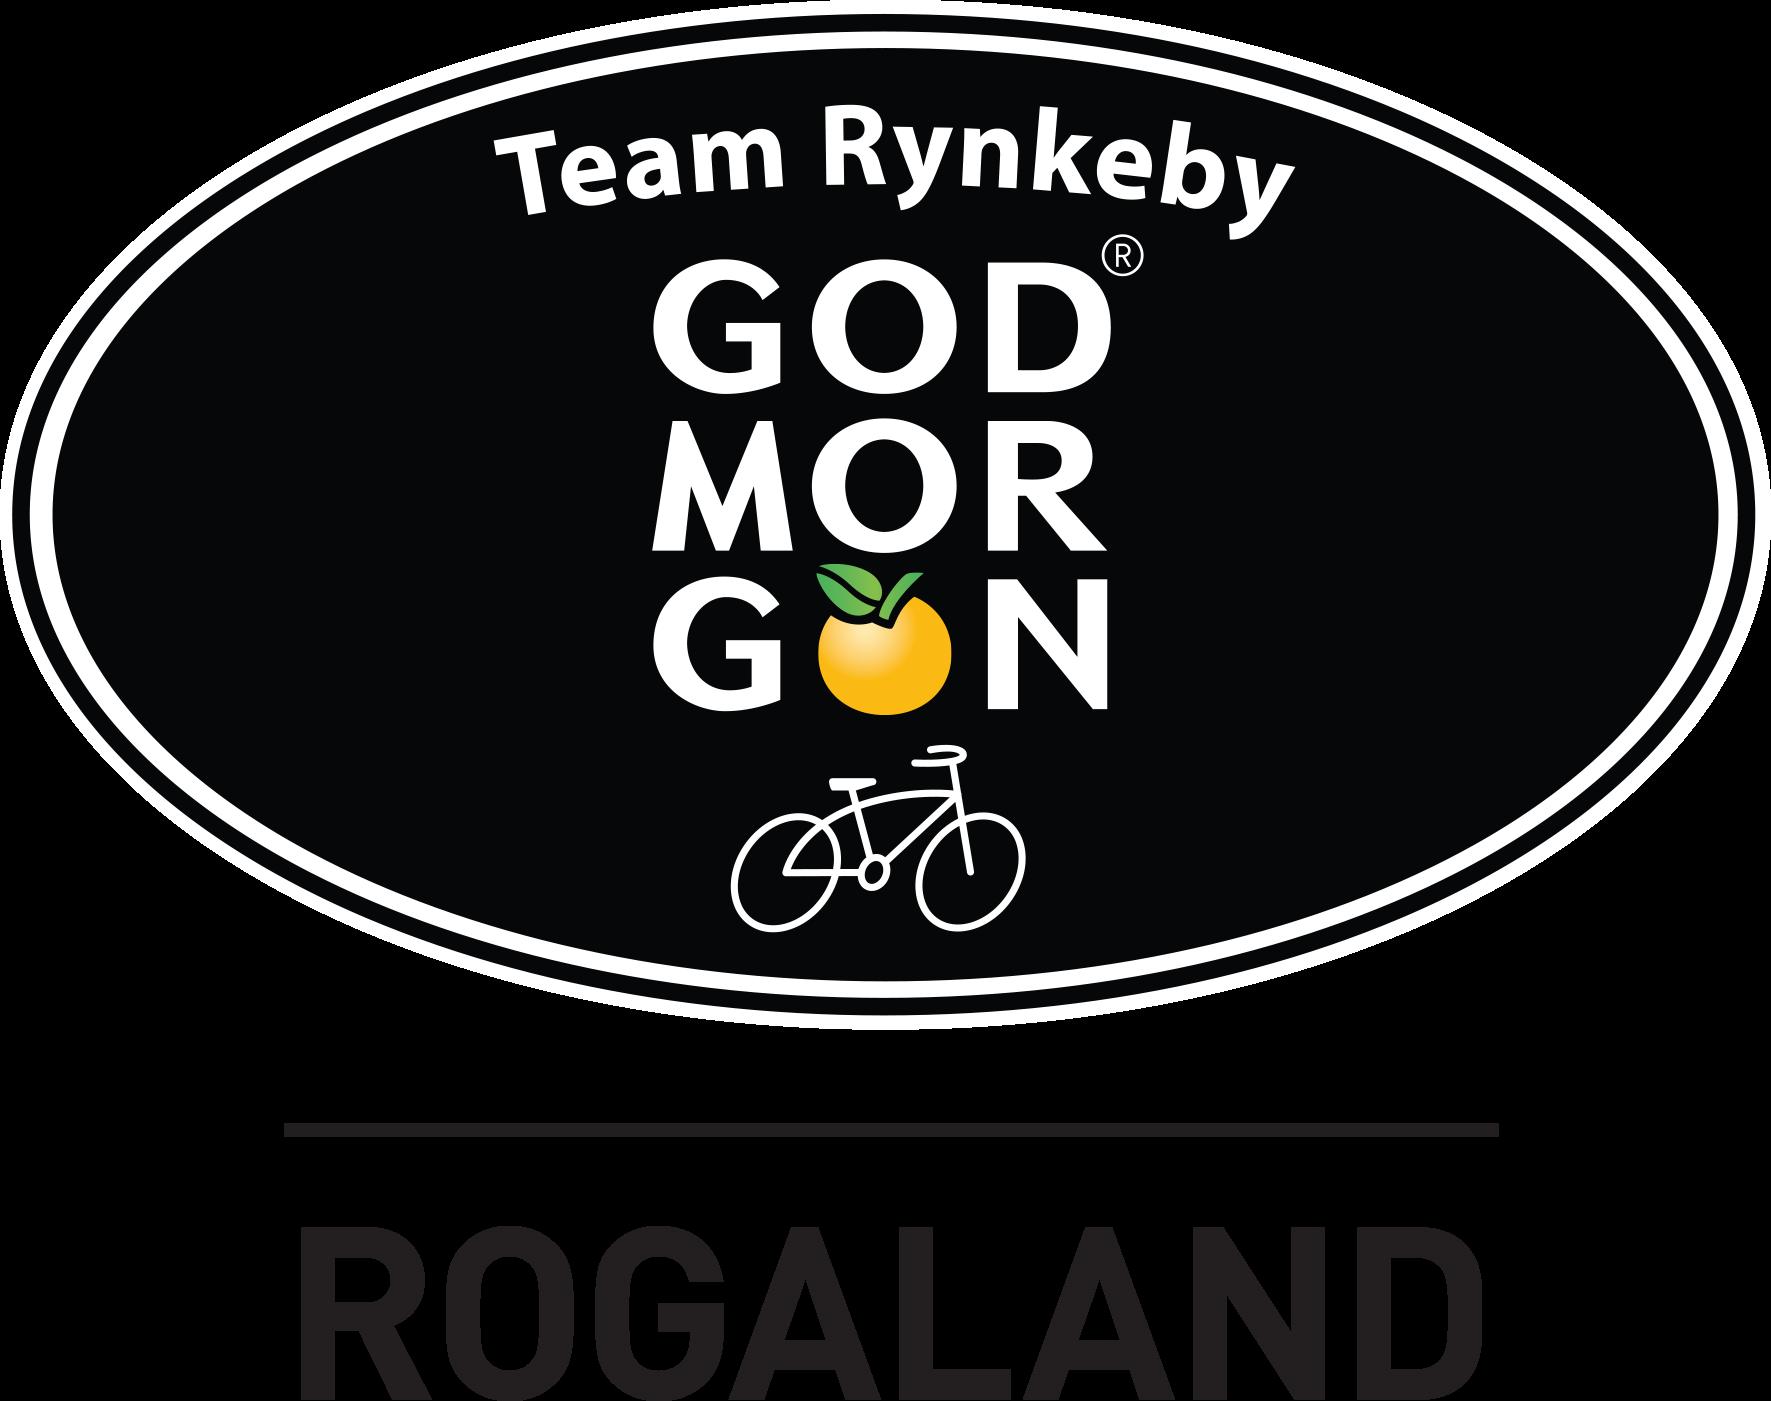 TR_Godmorgon_Rogaland_logo kopi.png